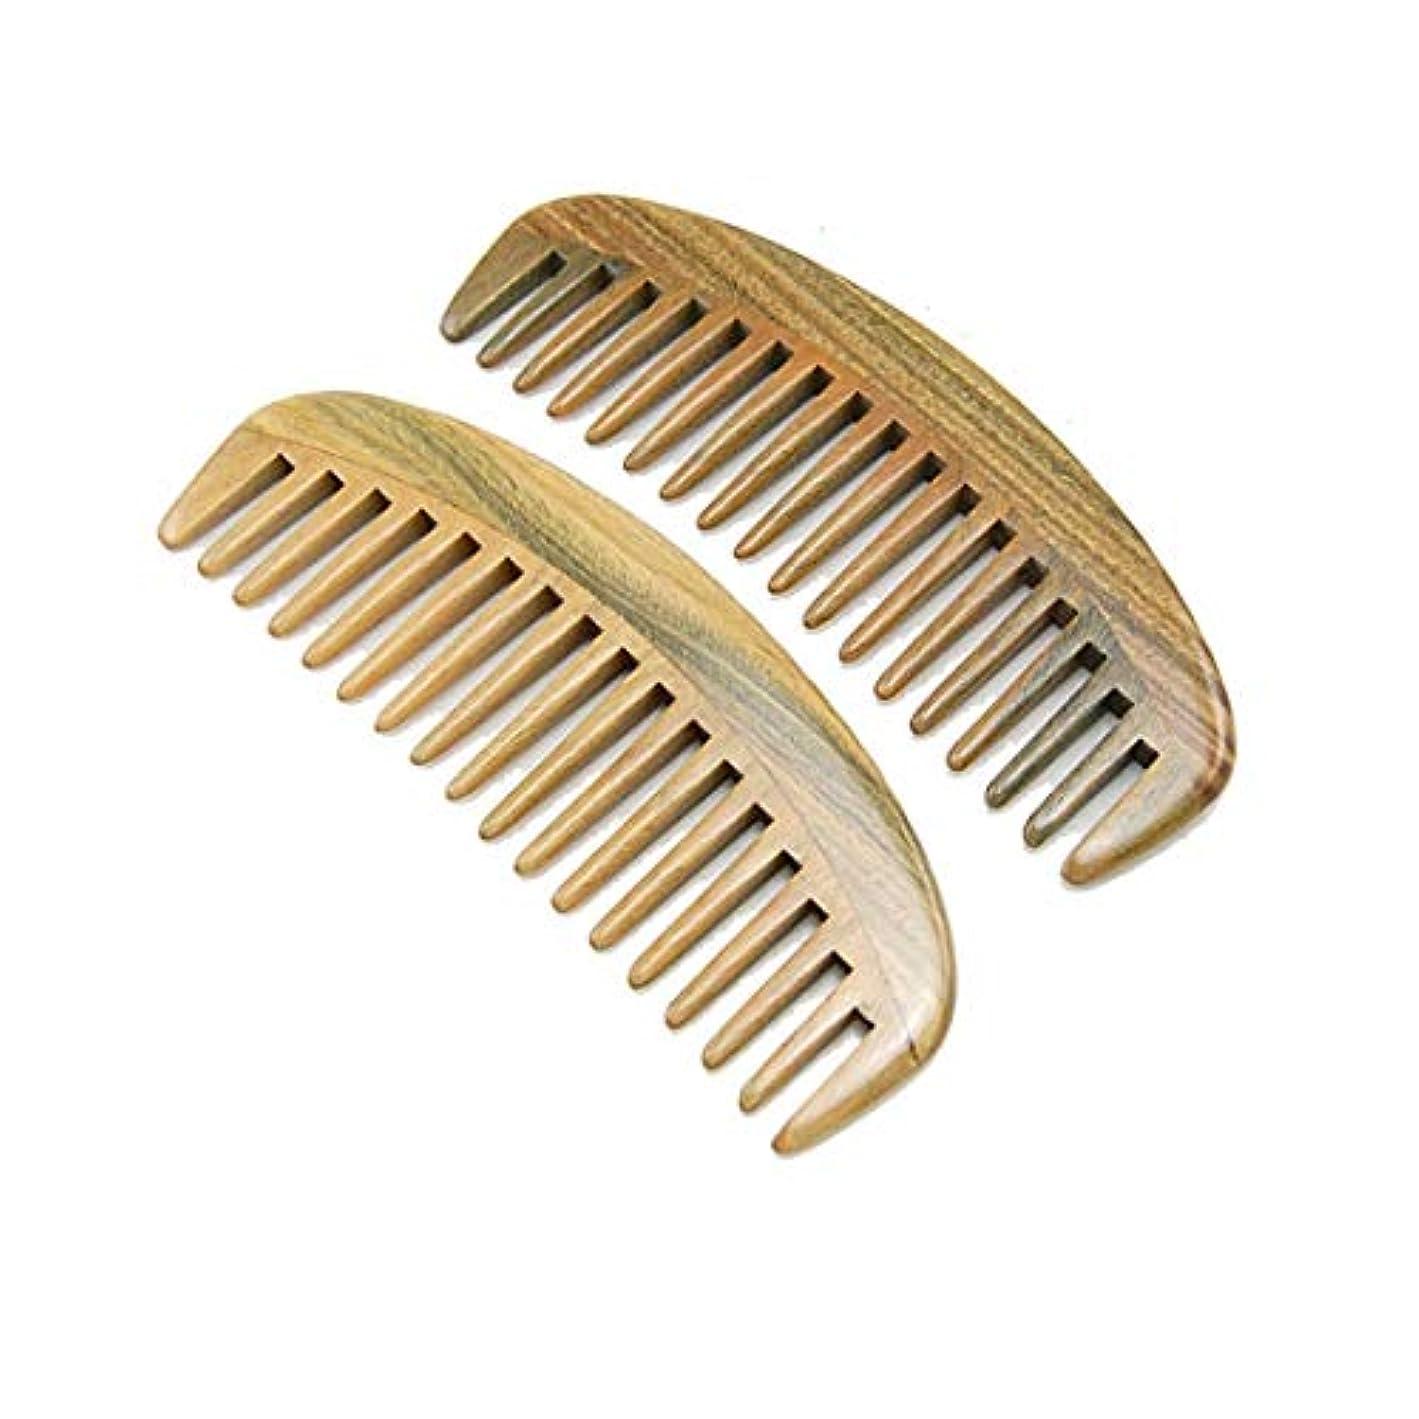 Guomao 2本の髪の櫛-男性女性と子供のための静的なもつれを解く自然な木製の櫛なし (色 : Wide tooth+Wide tooth)